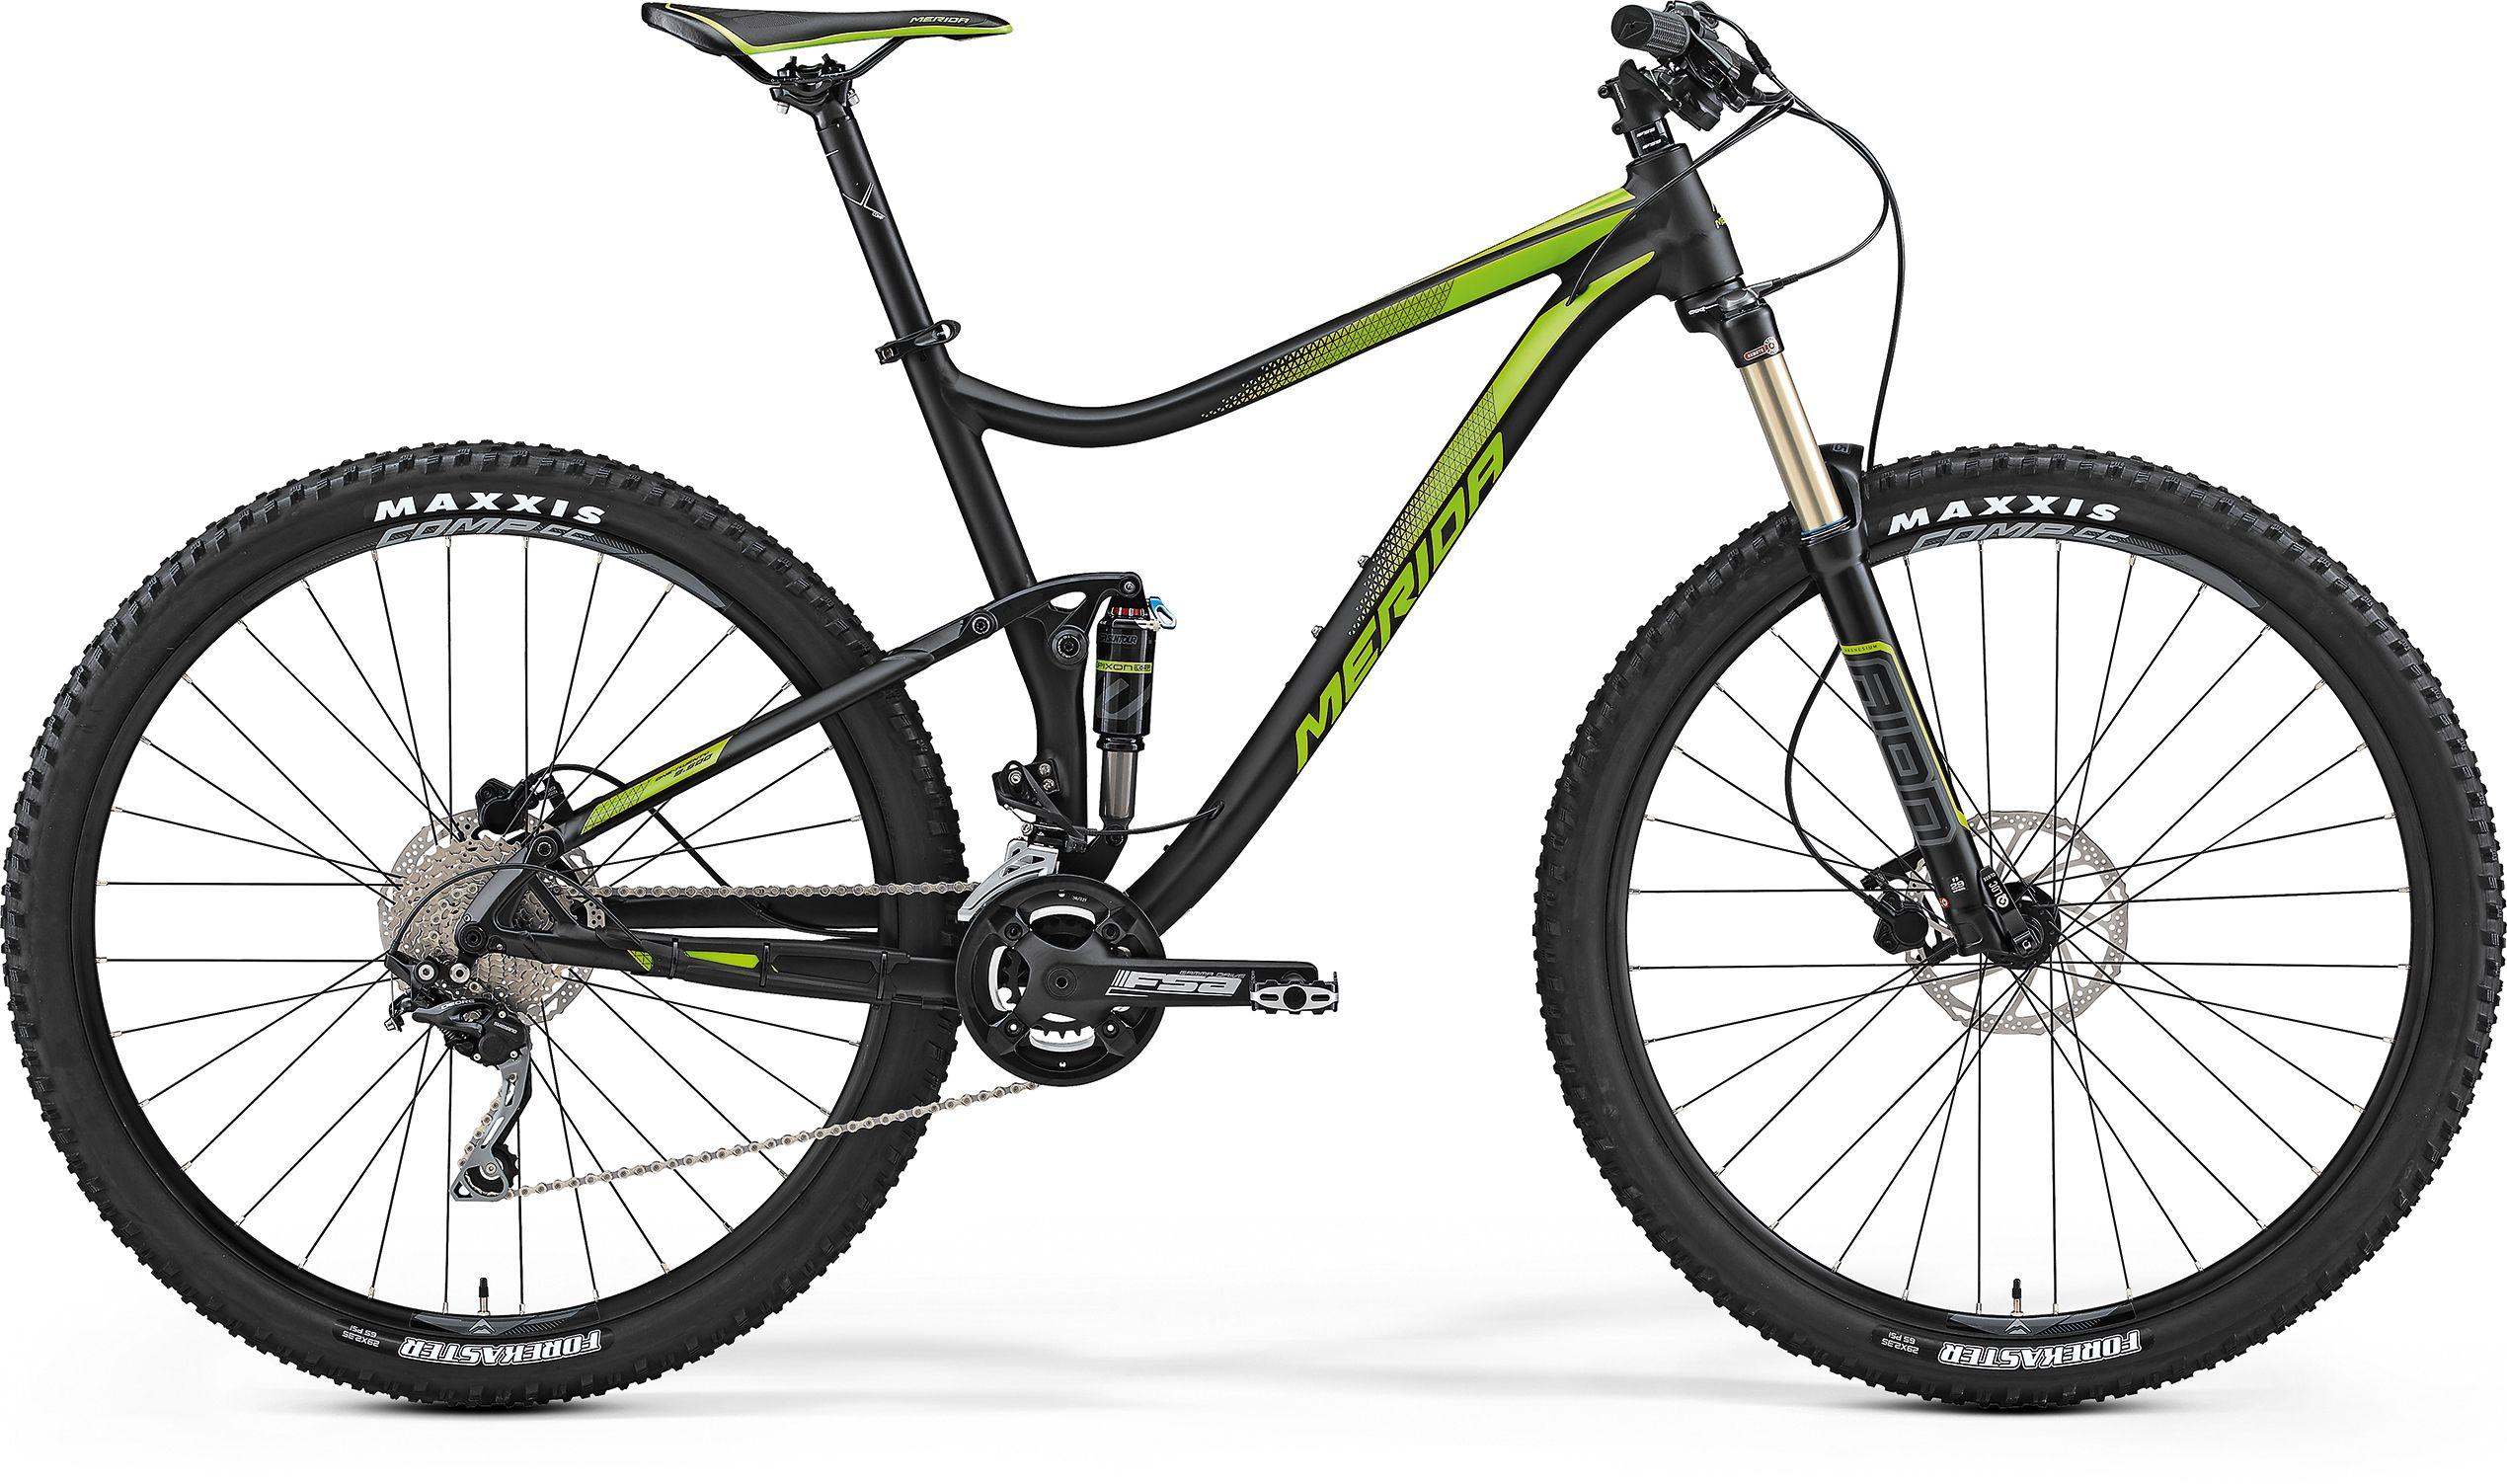 Велосипед Merida One-Twenty 9.500 2017,  Двухподвесы  - артикул:274474